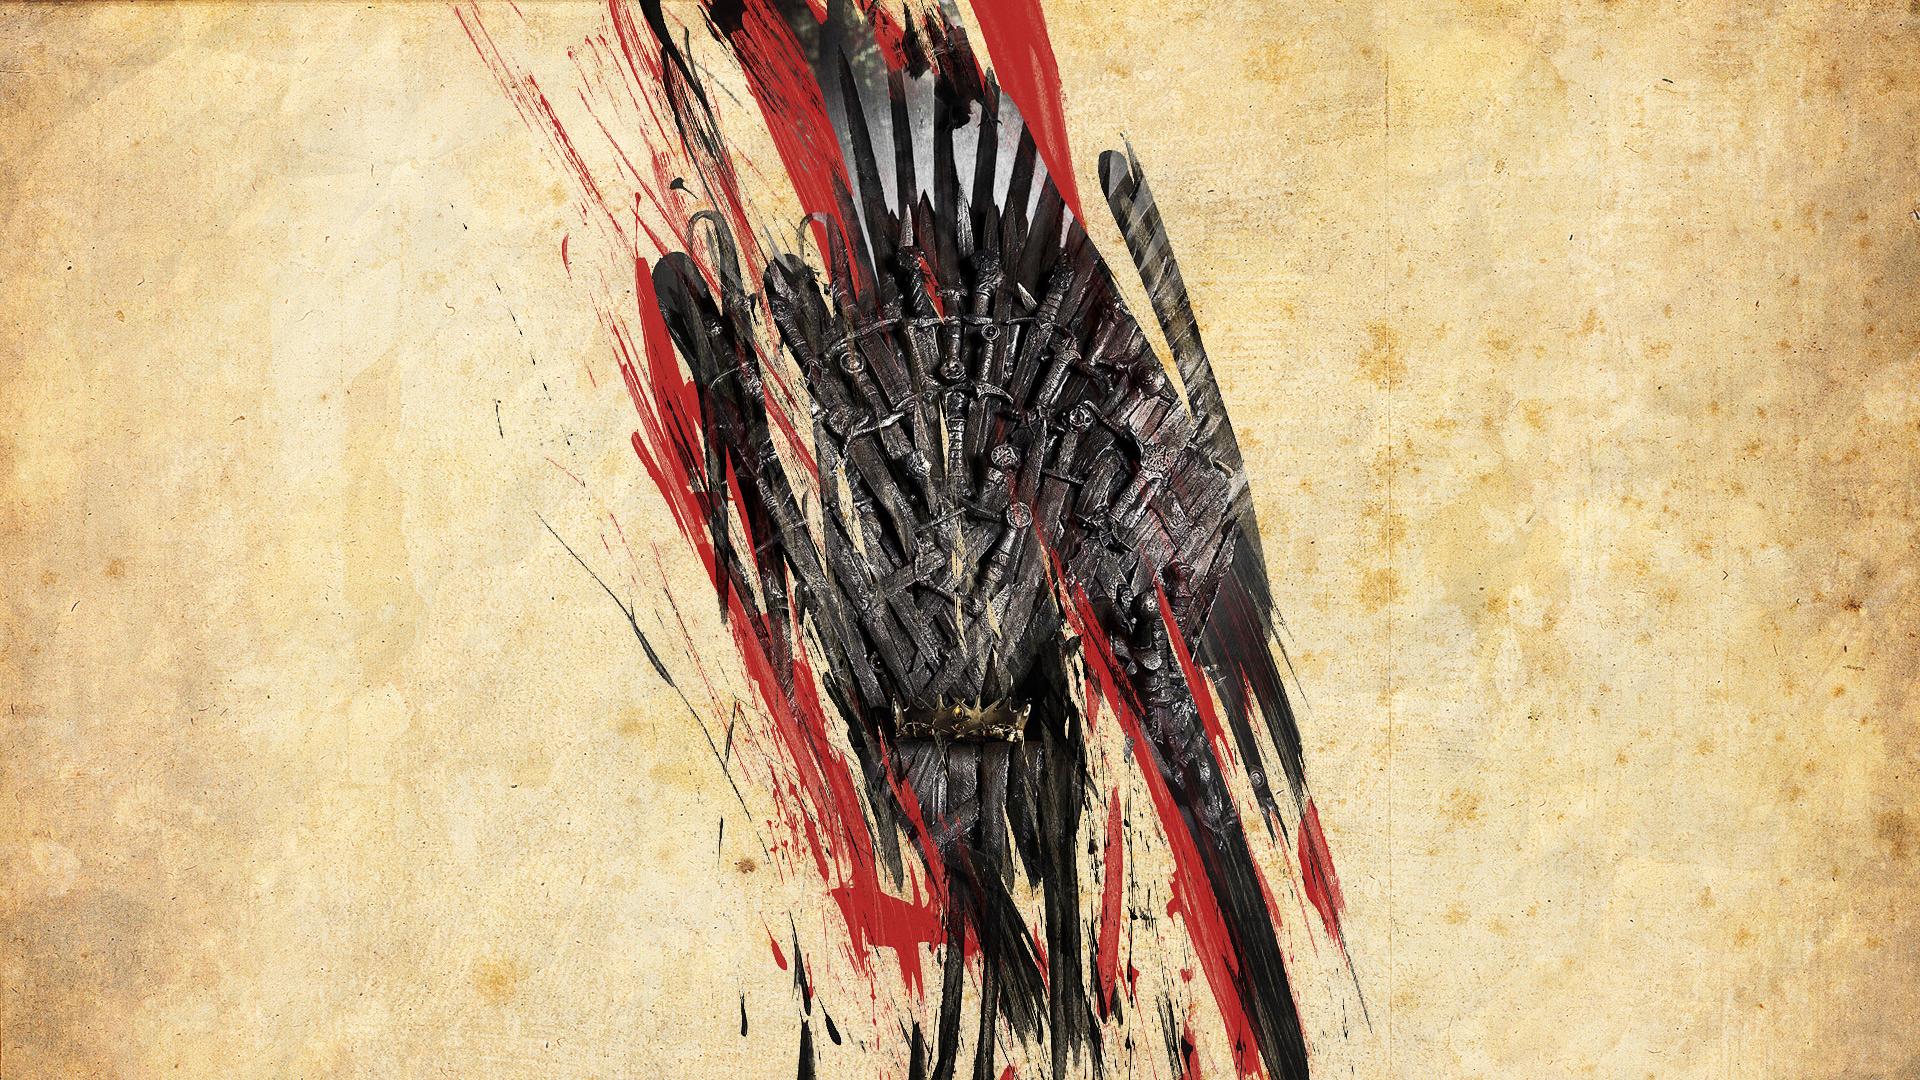 Game of Thrones Wallpaper   1920x1080 by Deadman619 1920x1080